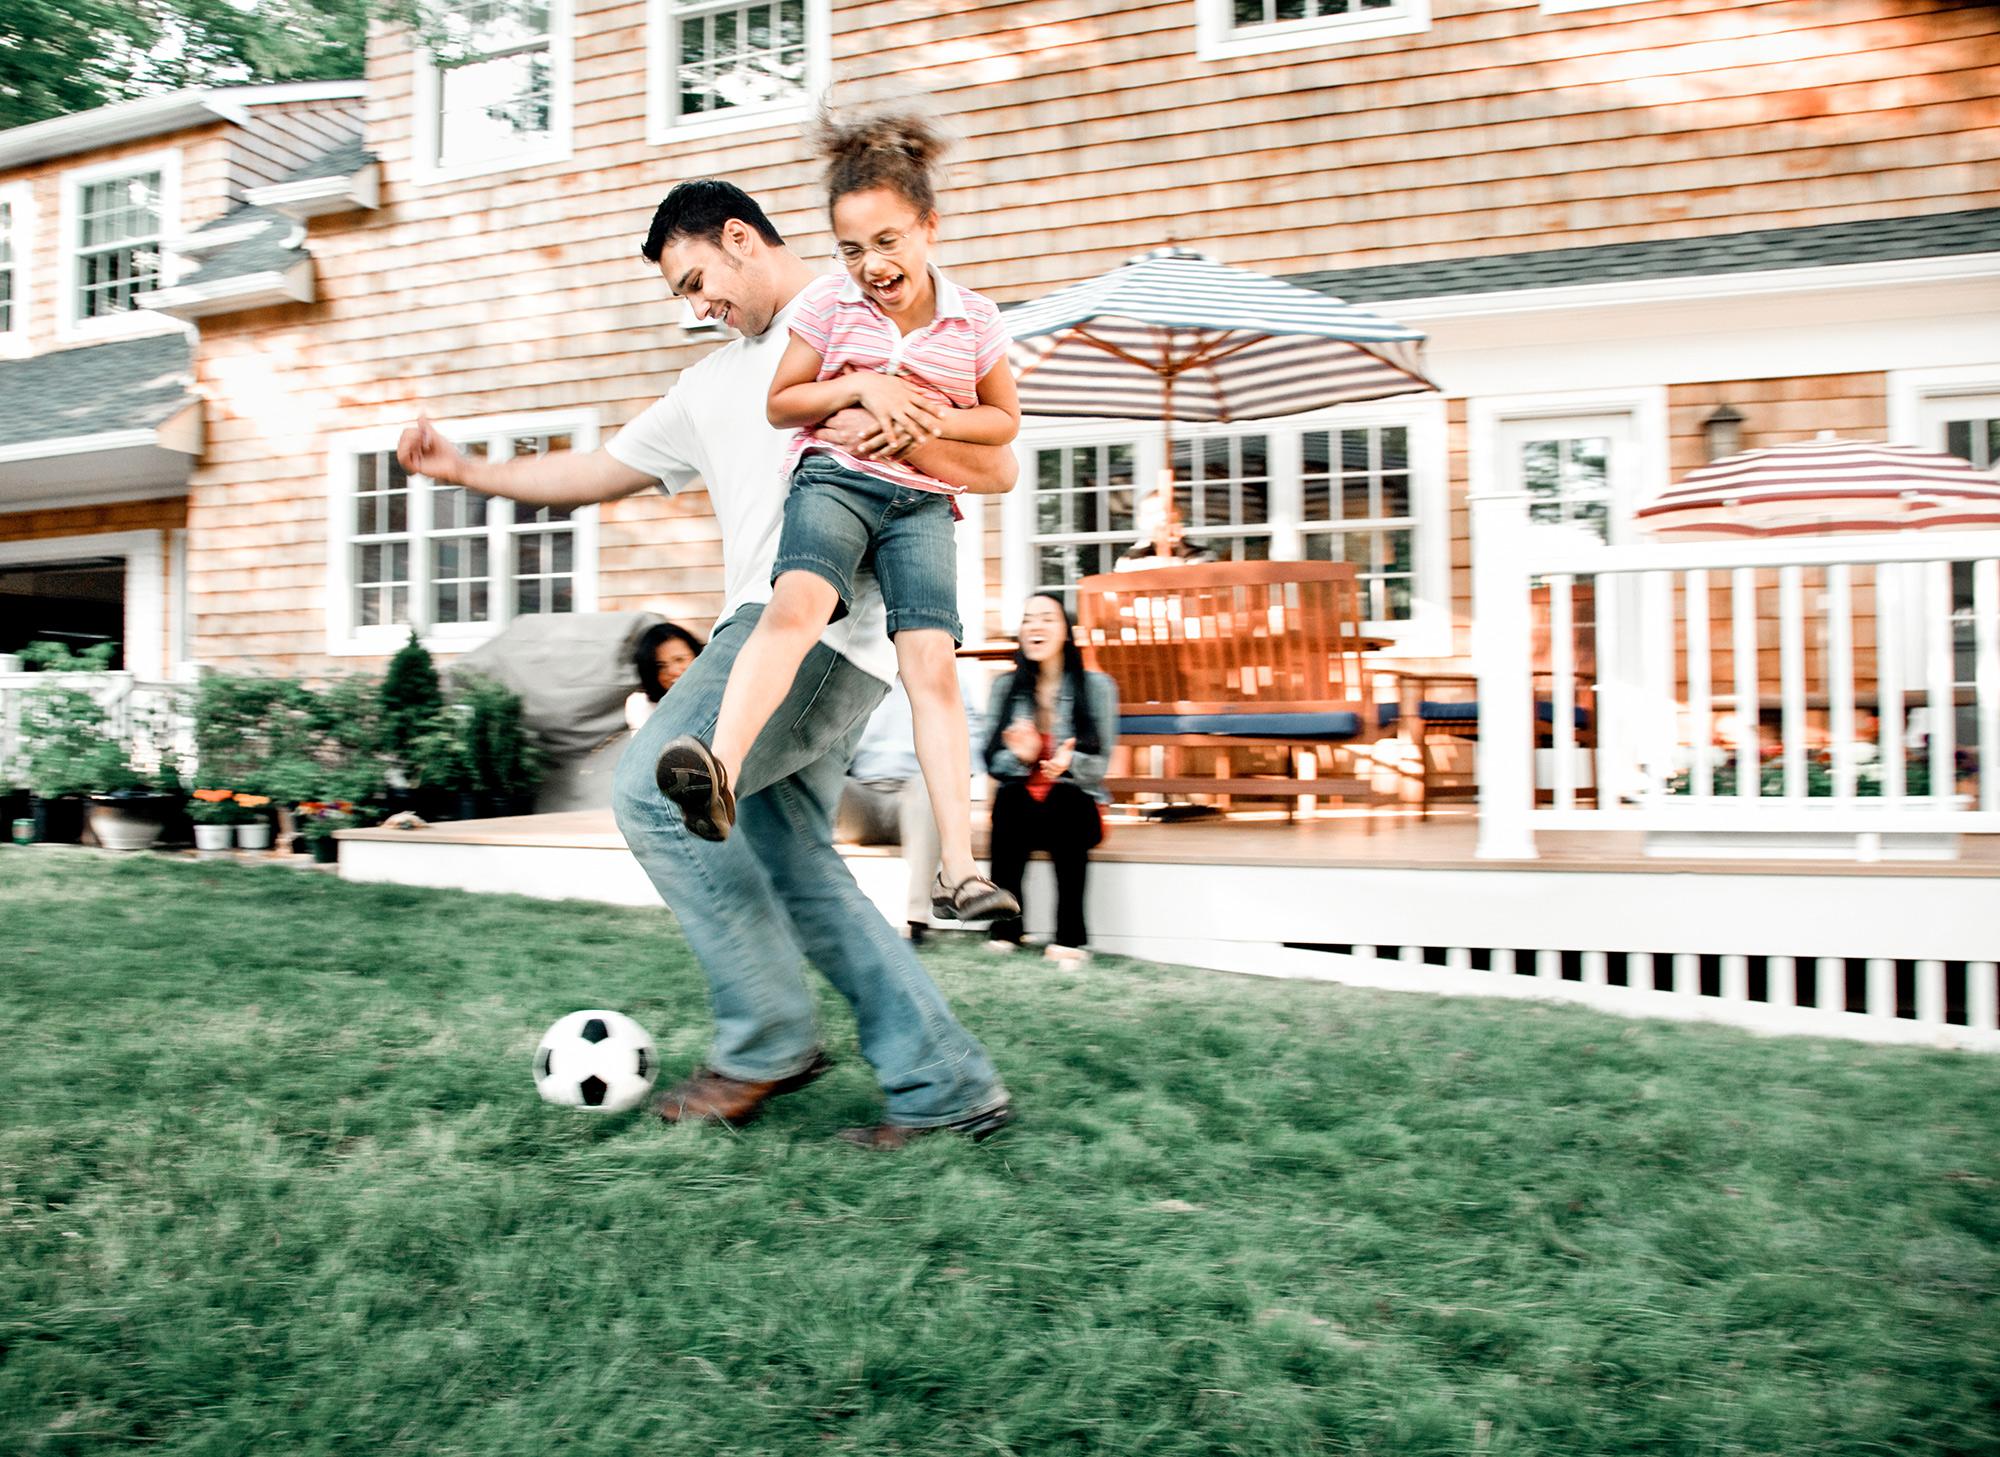 Family in Big Backyard | THA Mortgage